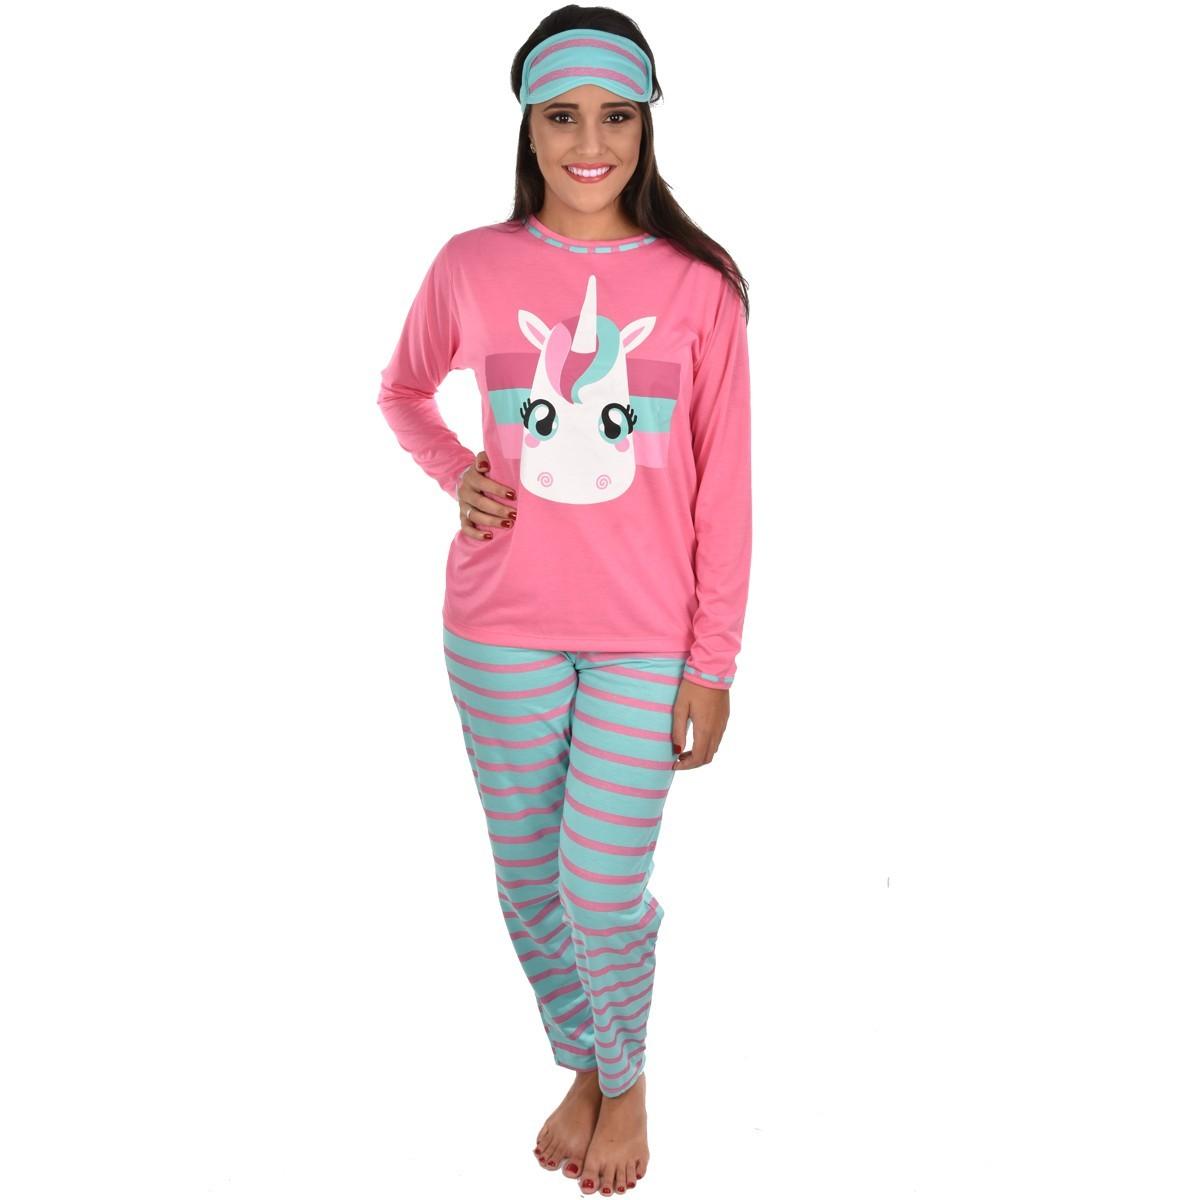 Pijama Longo Calça C/ Tapa Olho Feminino Adulto Estampa Desenho Unicórnio 310